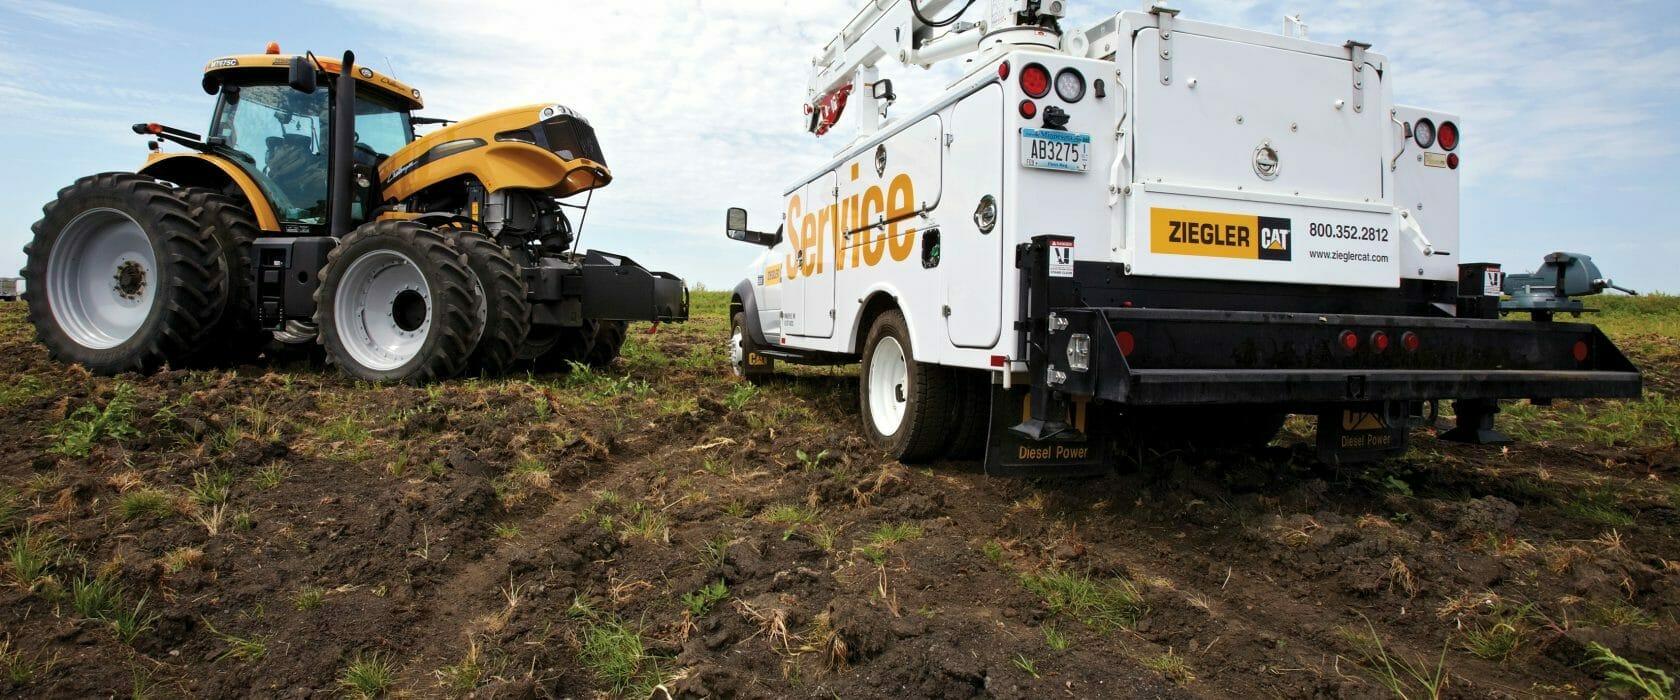 Ag field service